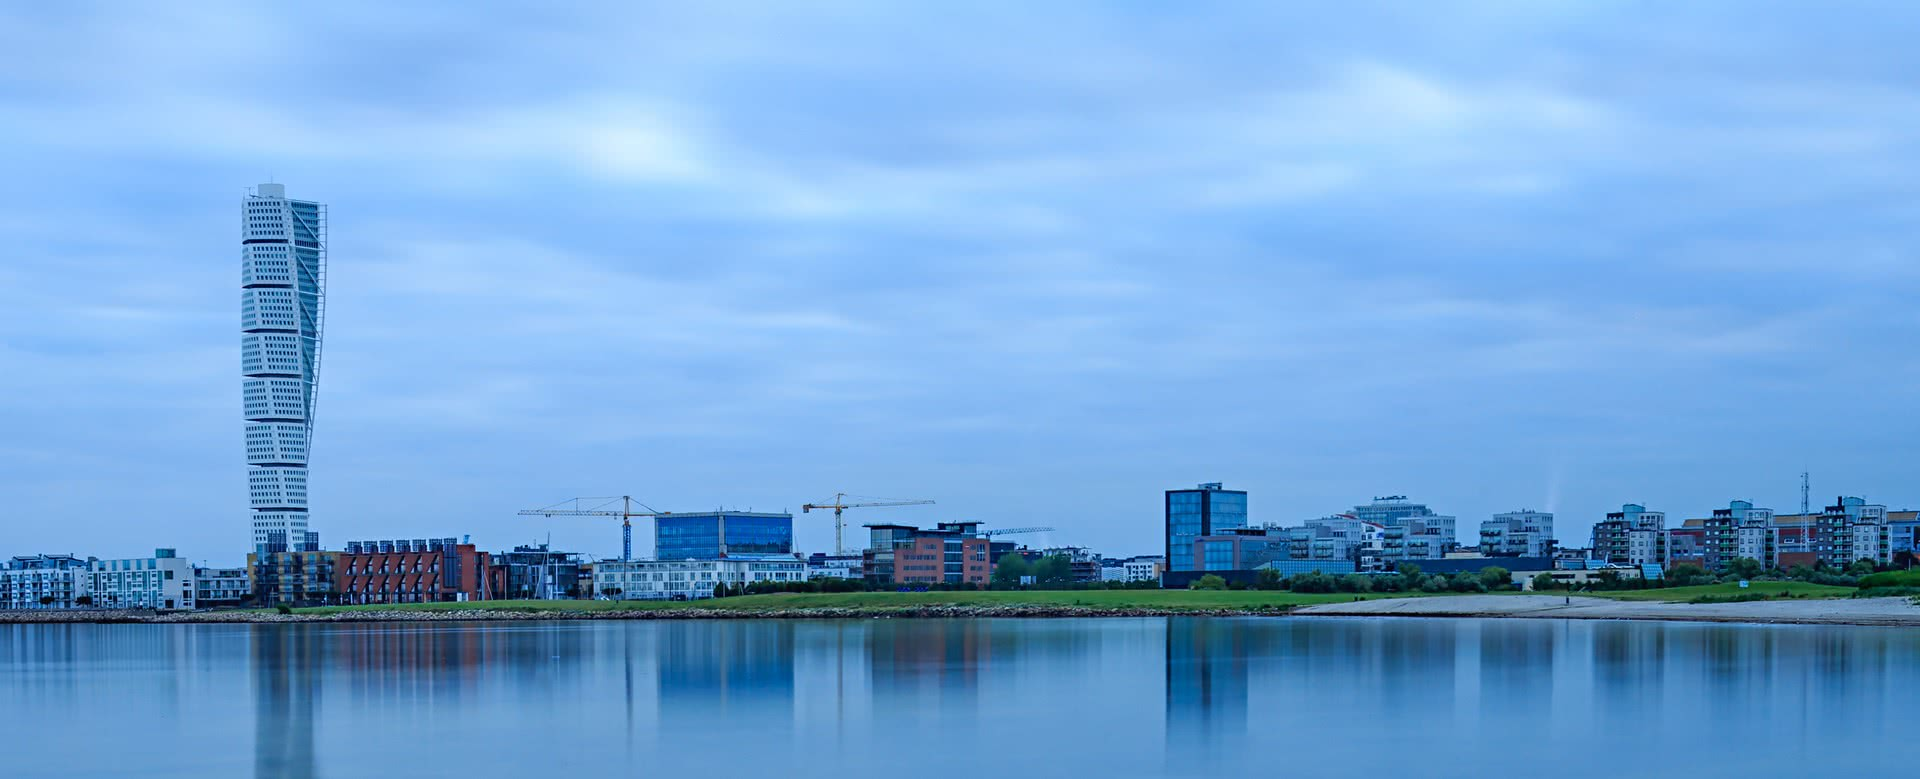 Titelbild von Malmö